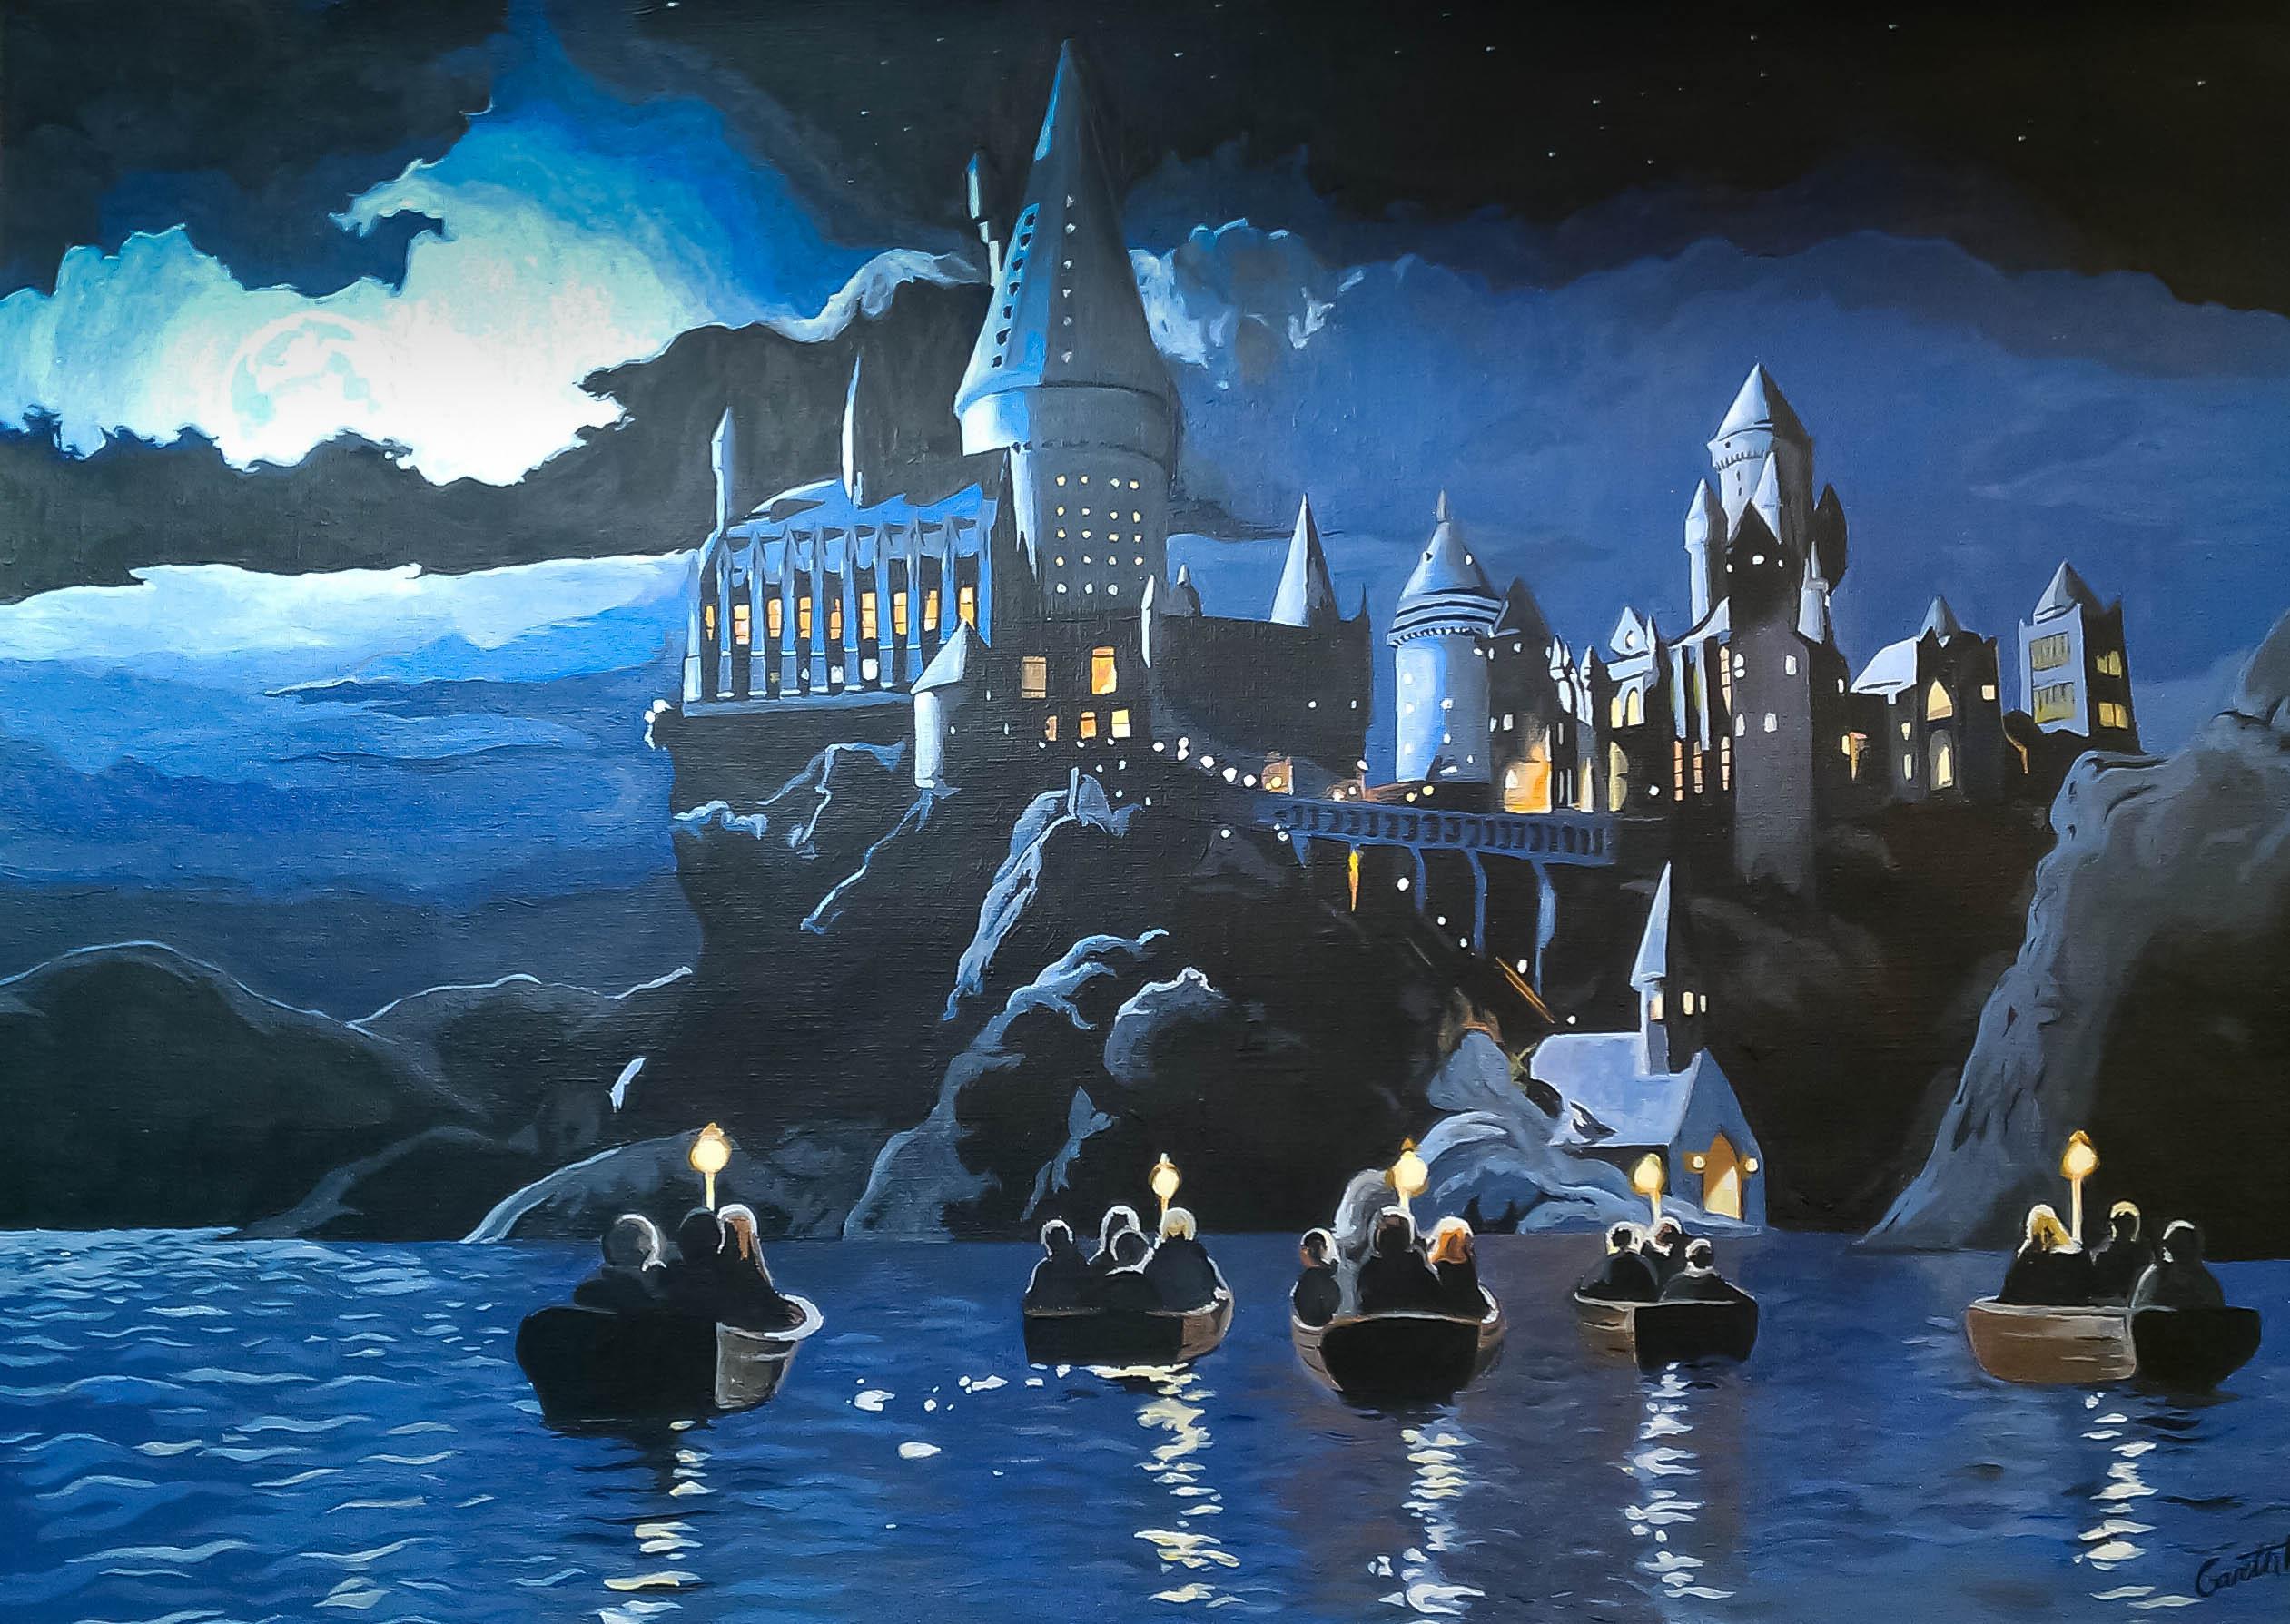 Starry Night Hogwarts Painting Www Imgkid Com The Image Kid Has It